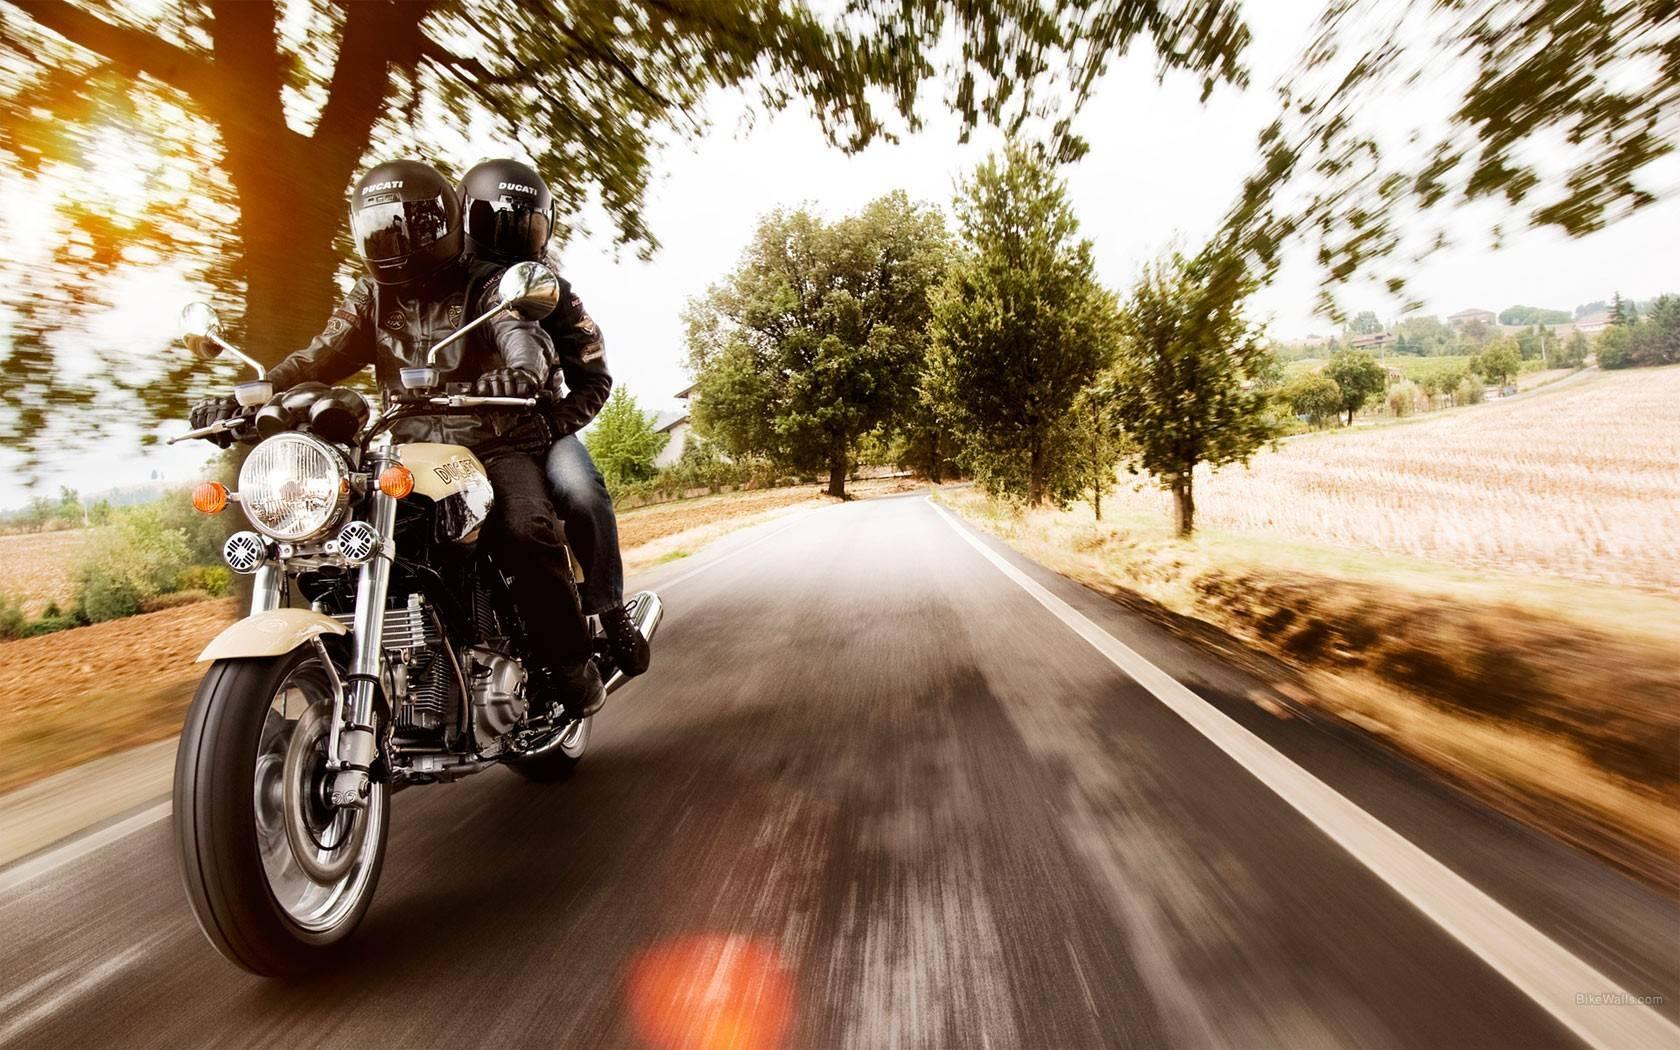 Biker Roads 1680x1050 Wallpaper 1679968